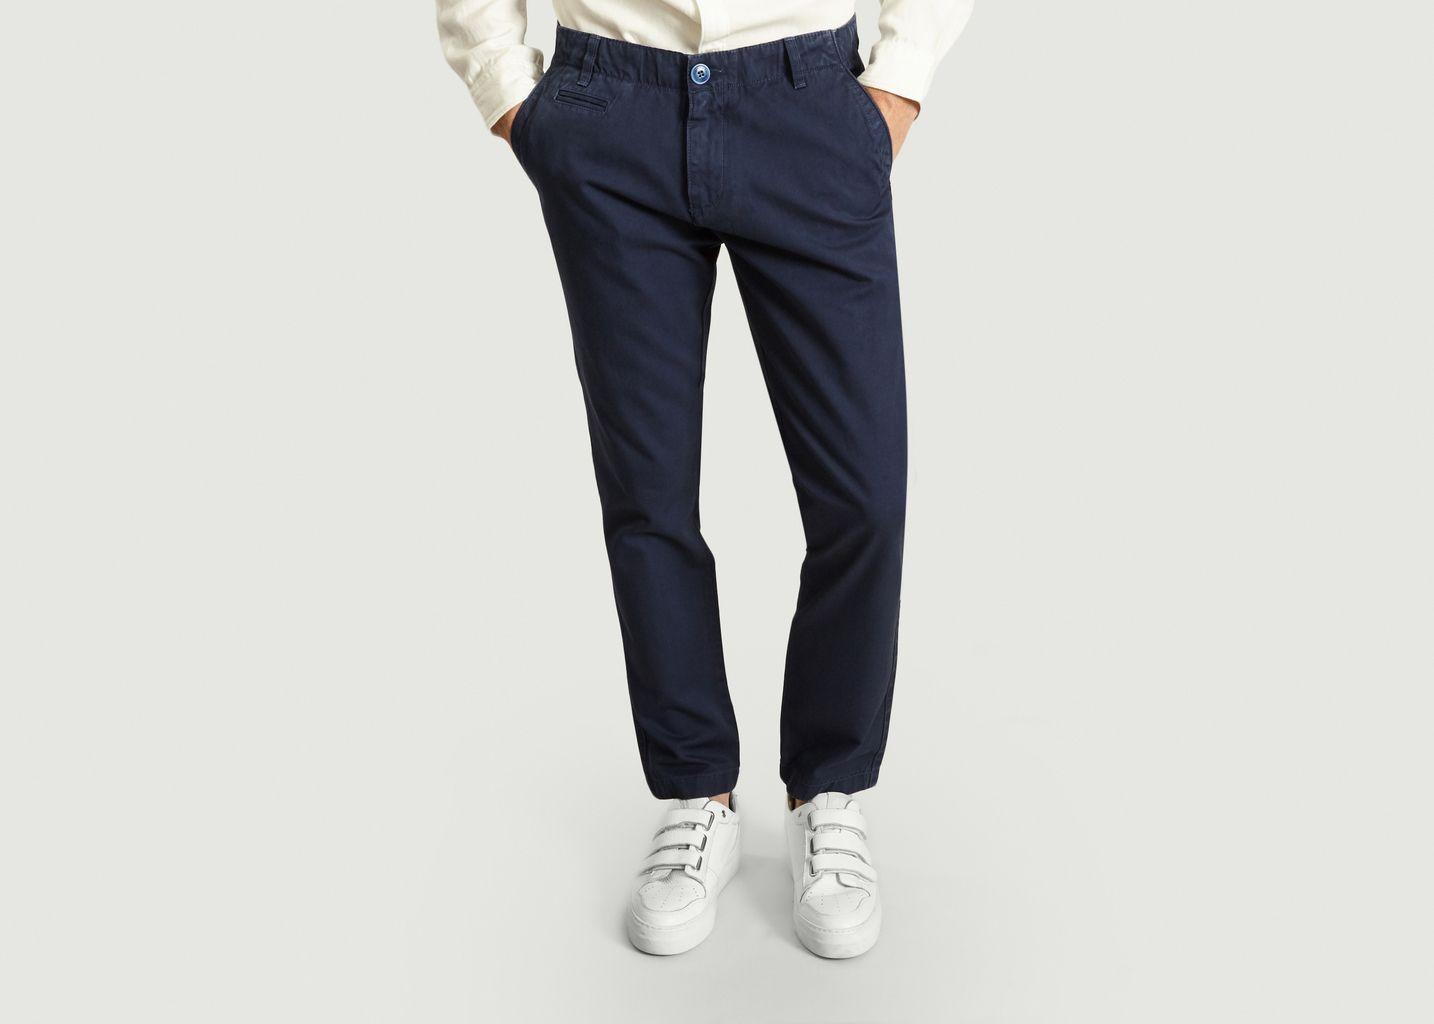 Pantalon Chino Chuck The Brain - Knowledge Cotton Apparel